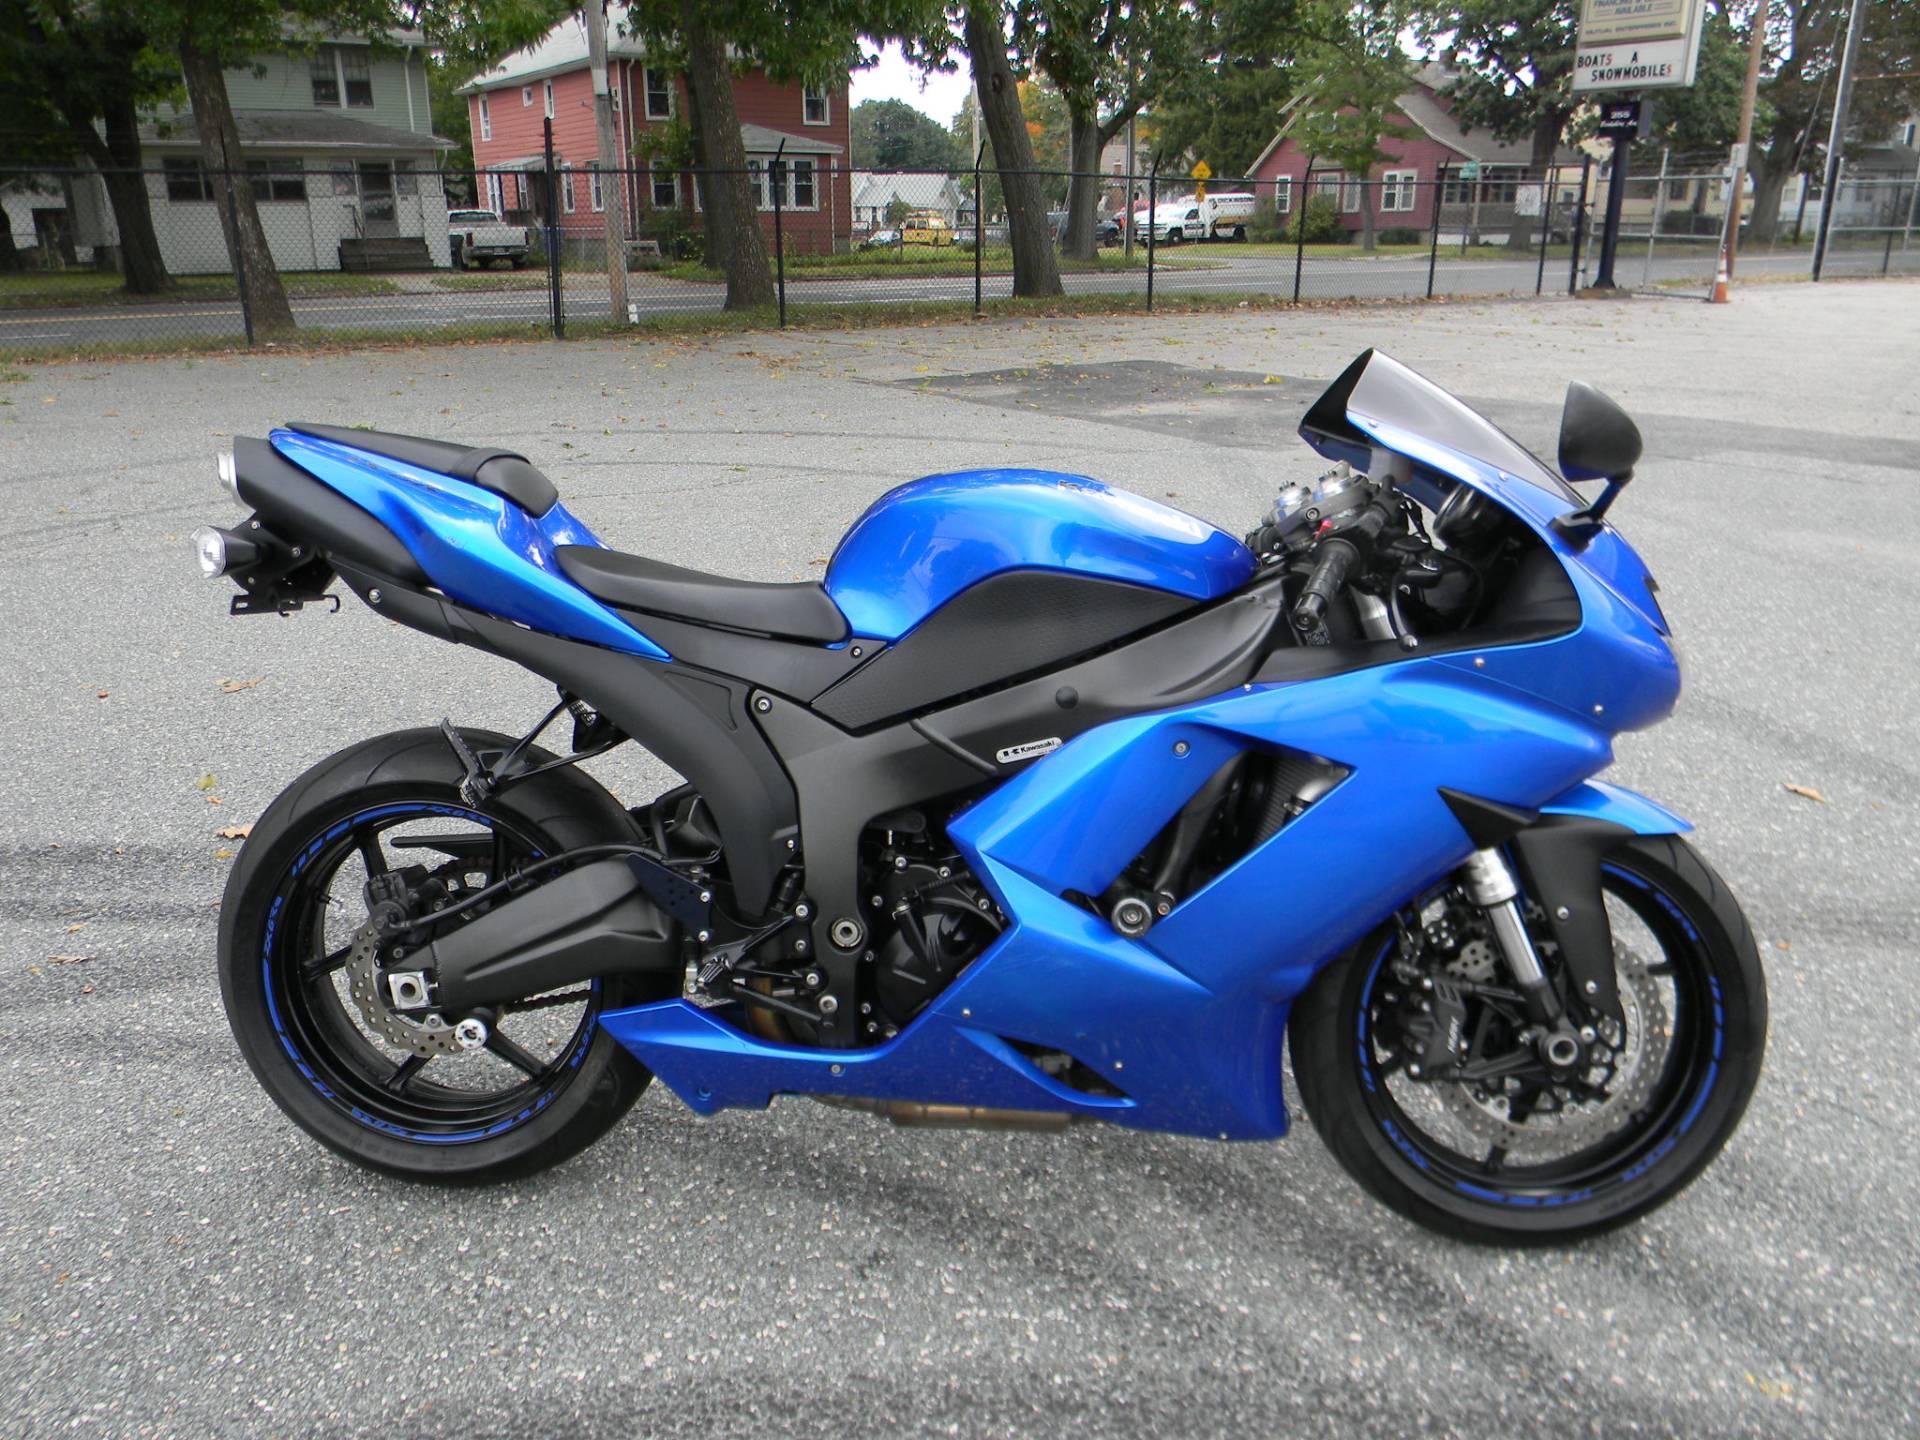 2008 Kawasaki Ninja ZX-6R for sale 1646